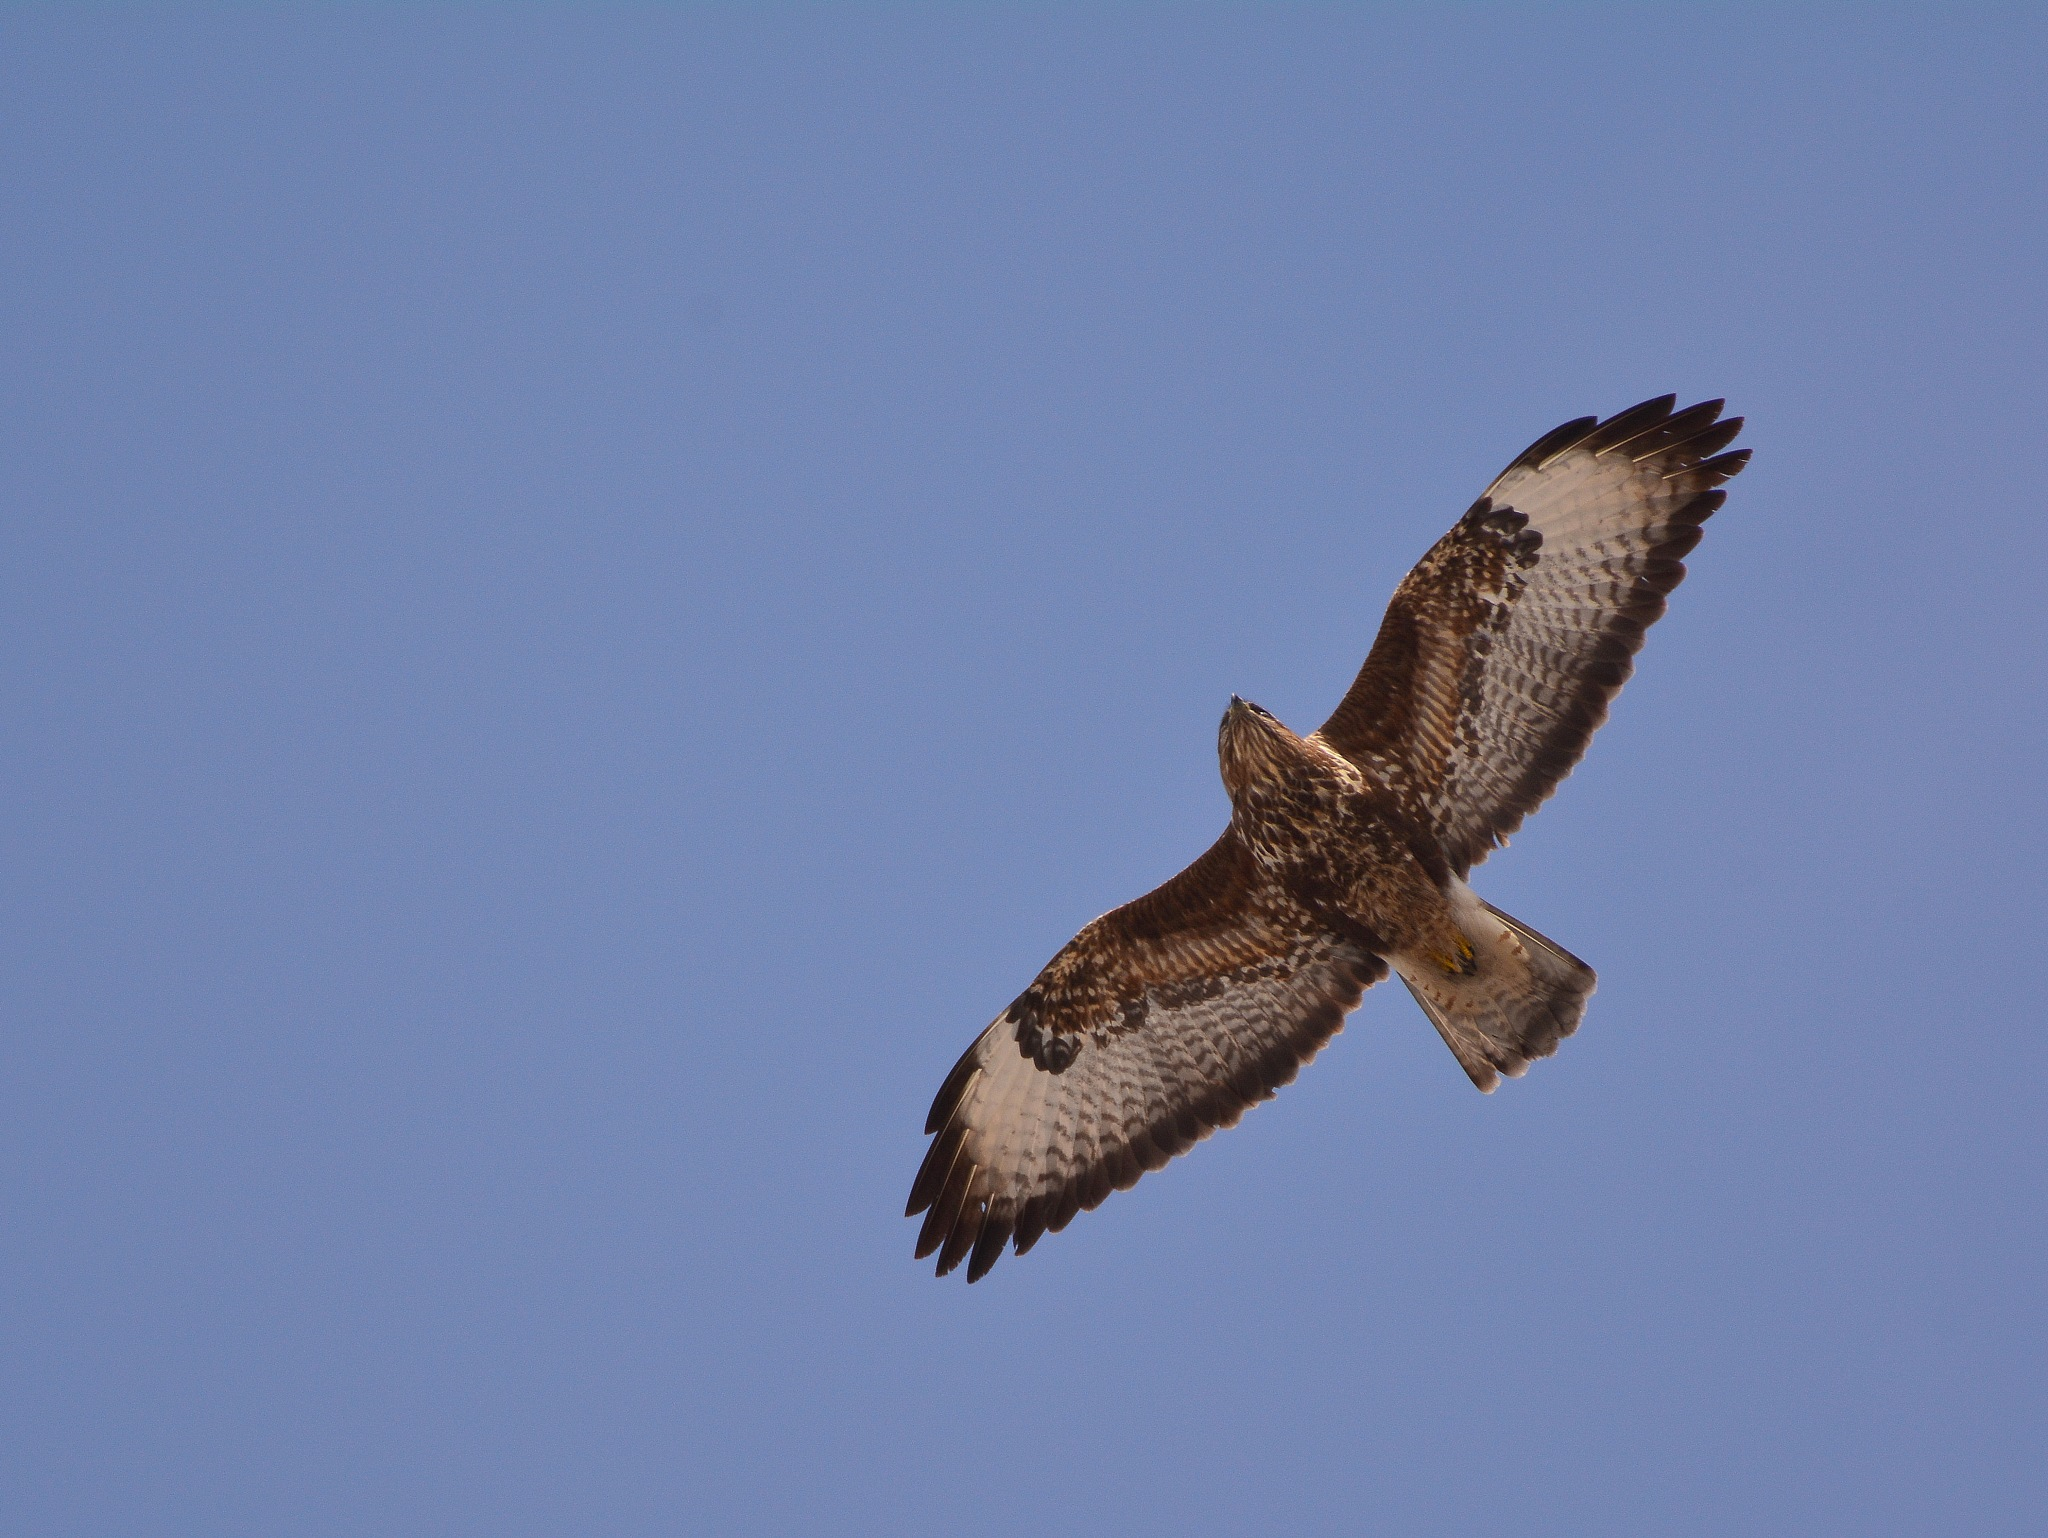 Common buzzard in flight by Egon Cokan